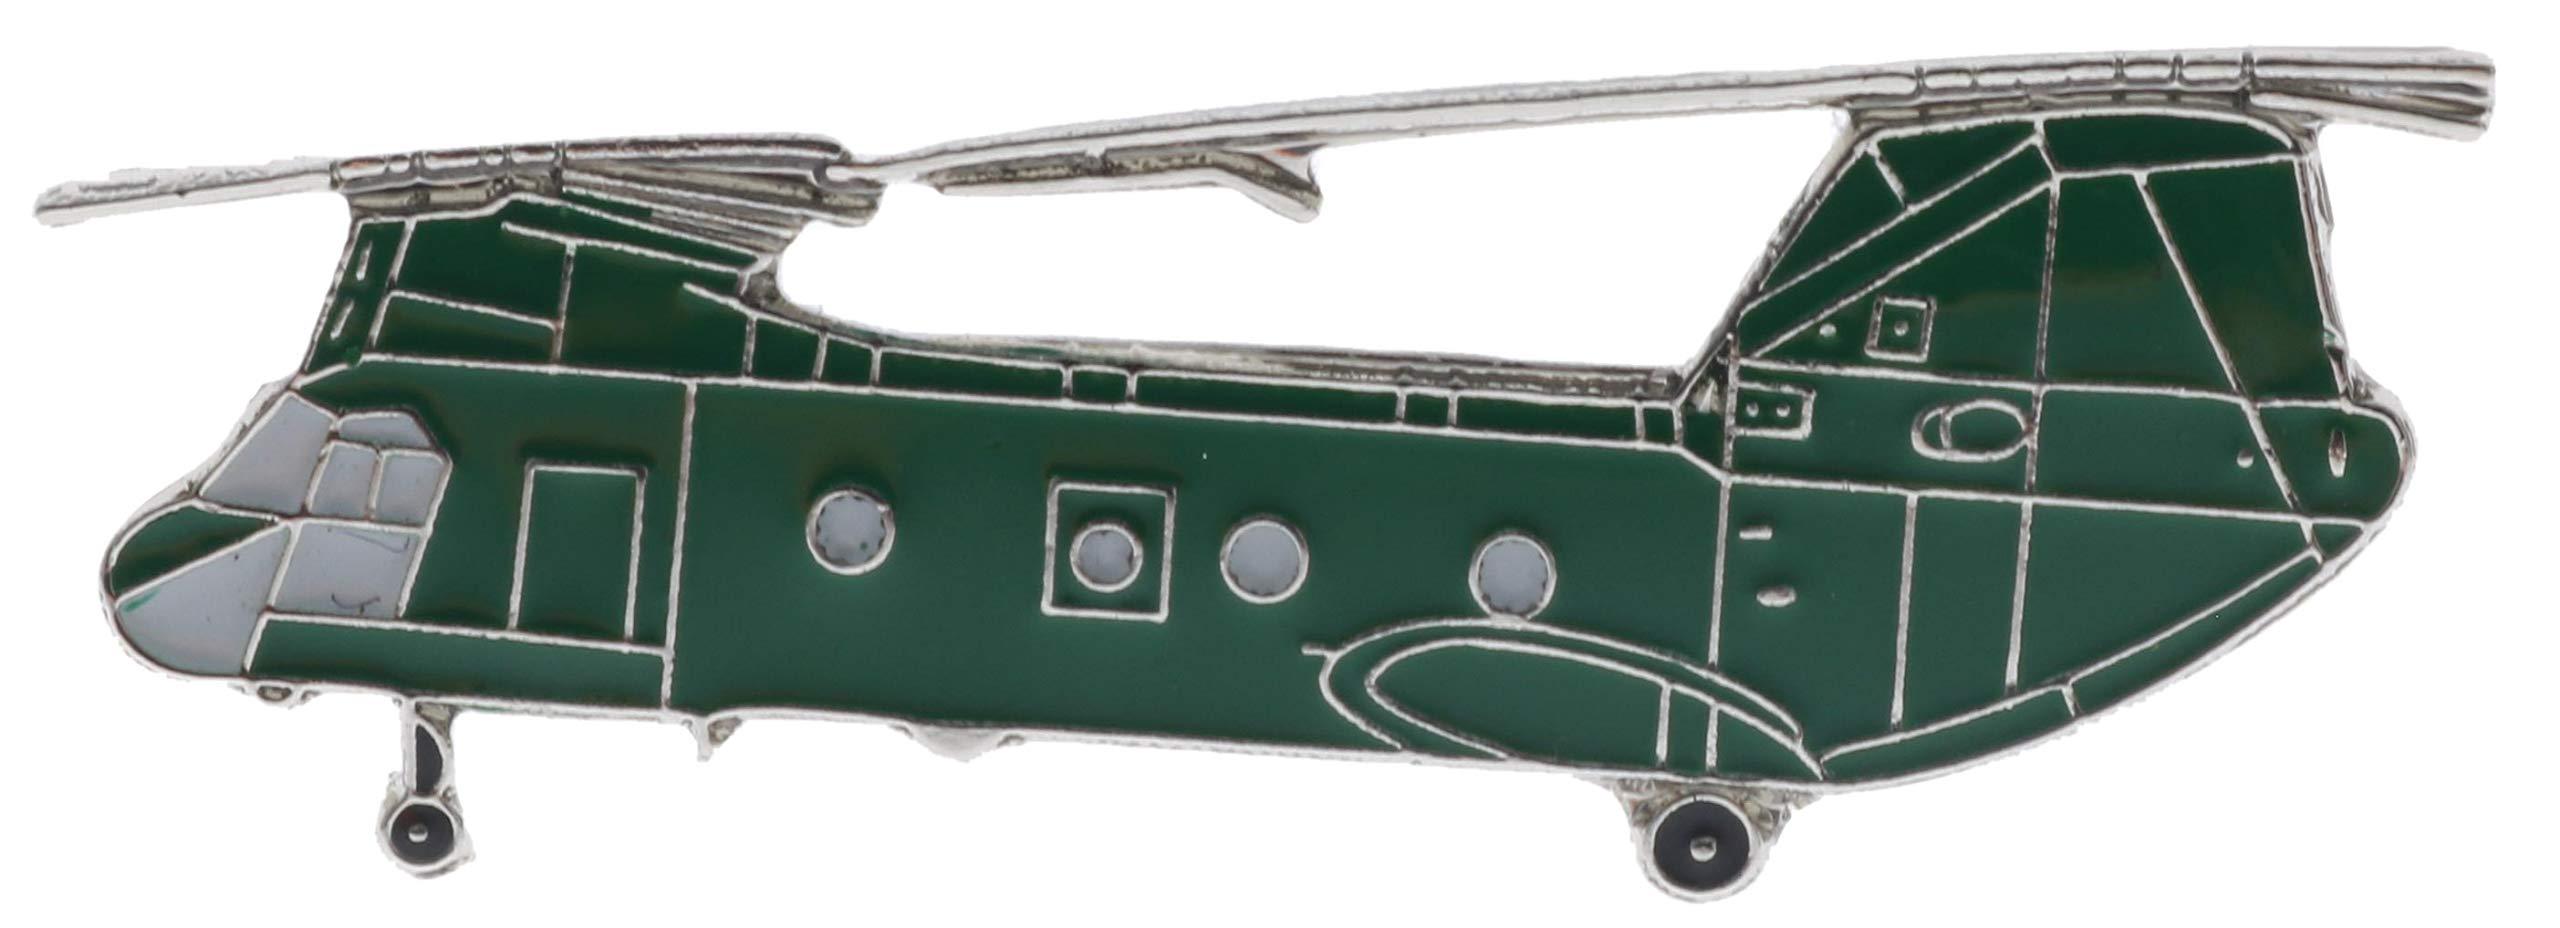 Sujak Military Items Boeing Vertol CH-46 Sea Knight Miniature Replica Hat or Lapel pin HON15902